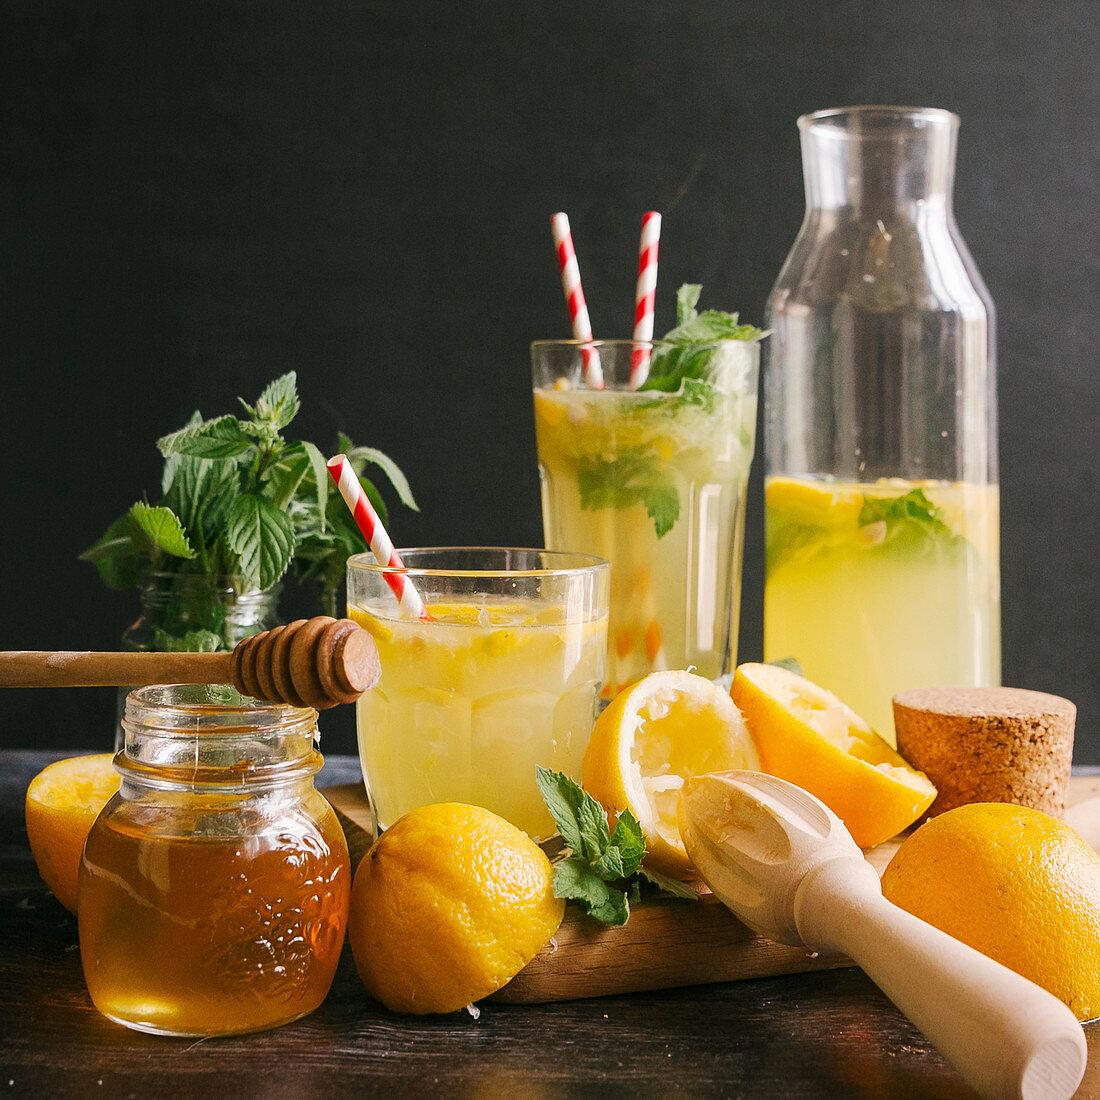 Lemonade with honey and herbs